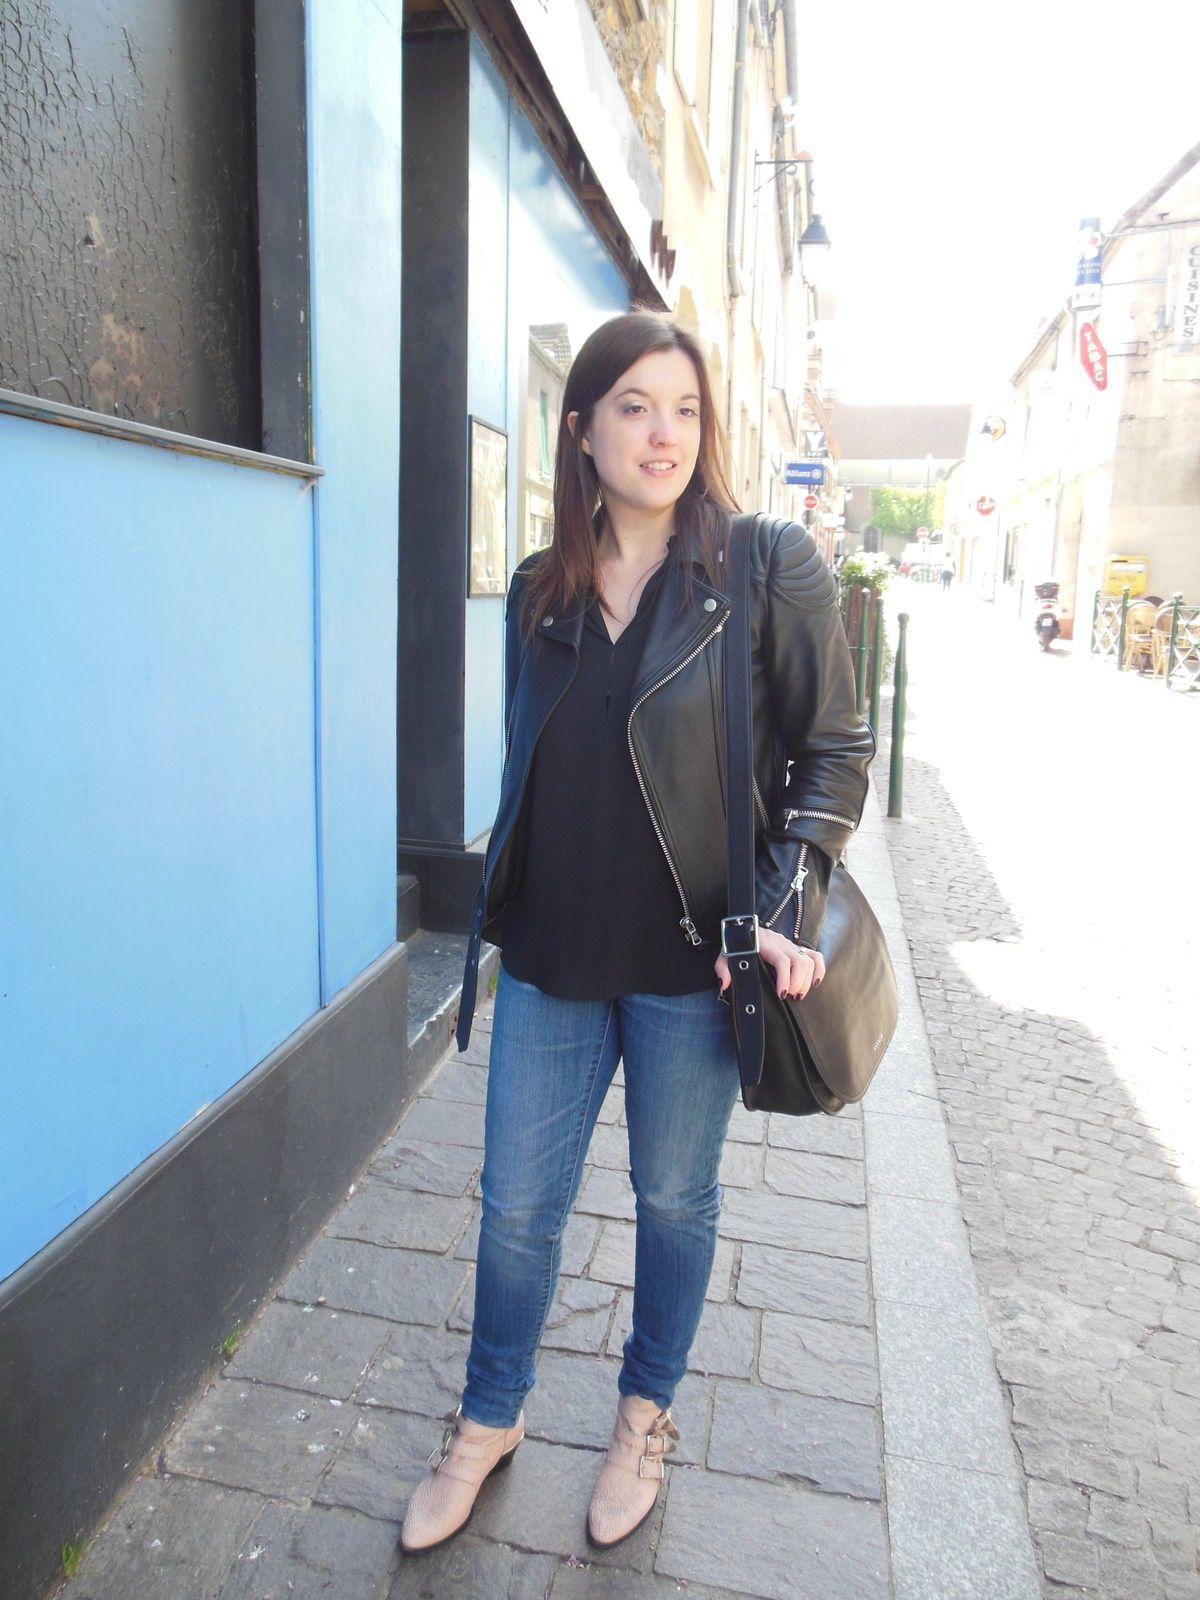 Blouson - Brooklyn Bridge Factory // Blouse & Jeans - Zara // Susanna Boots - Chloé // Sac - Coach